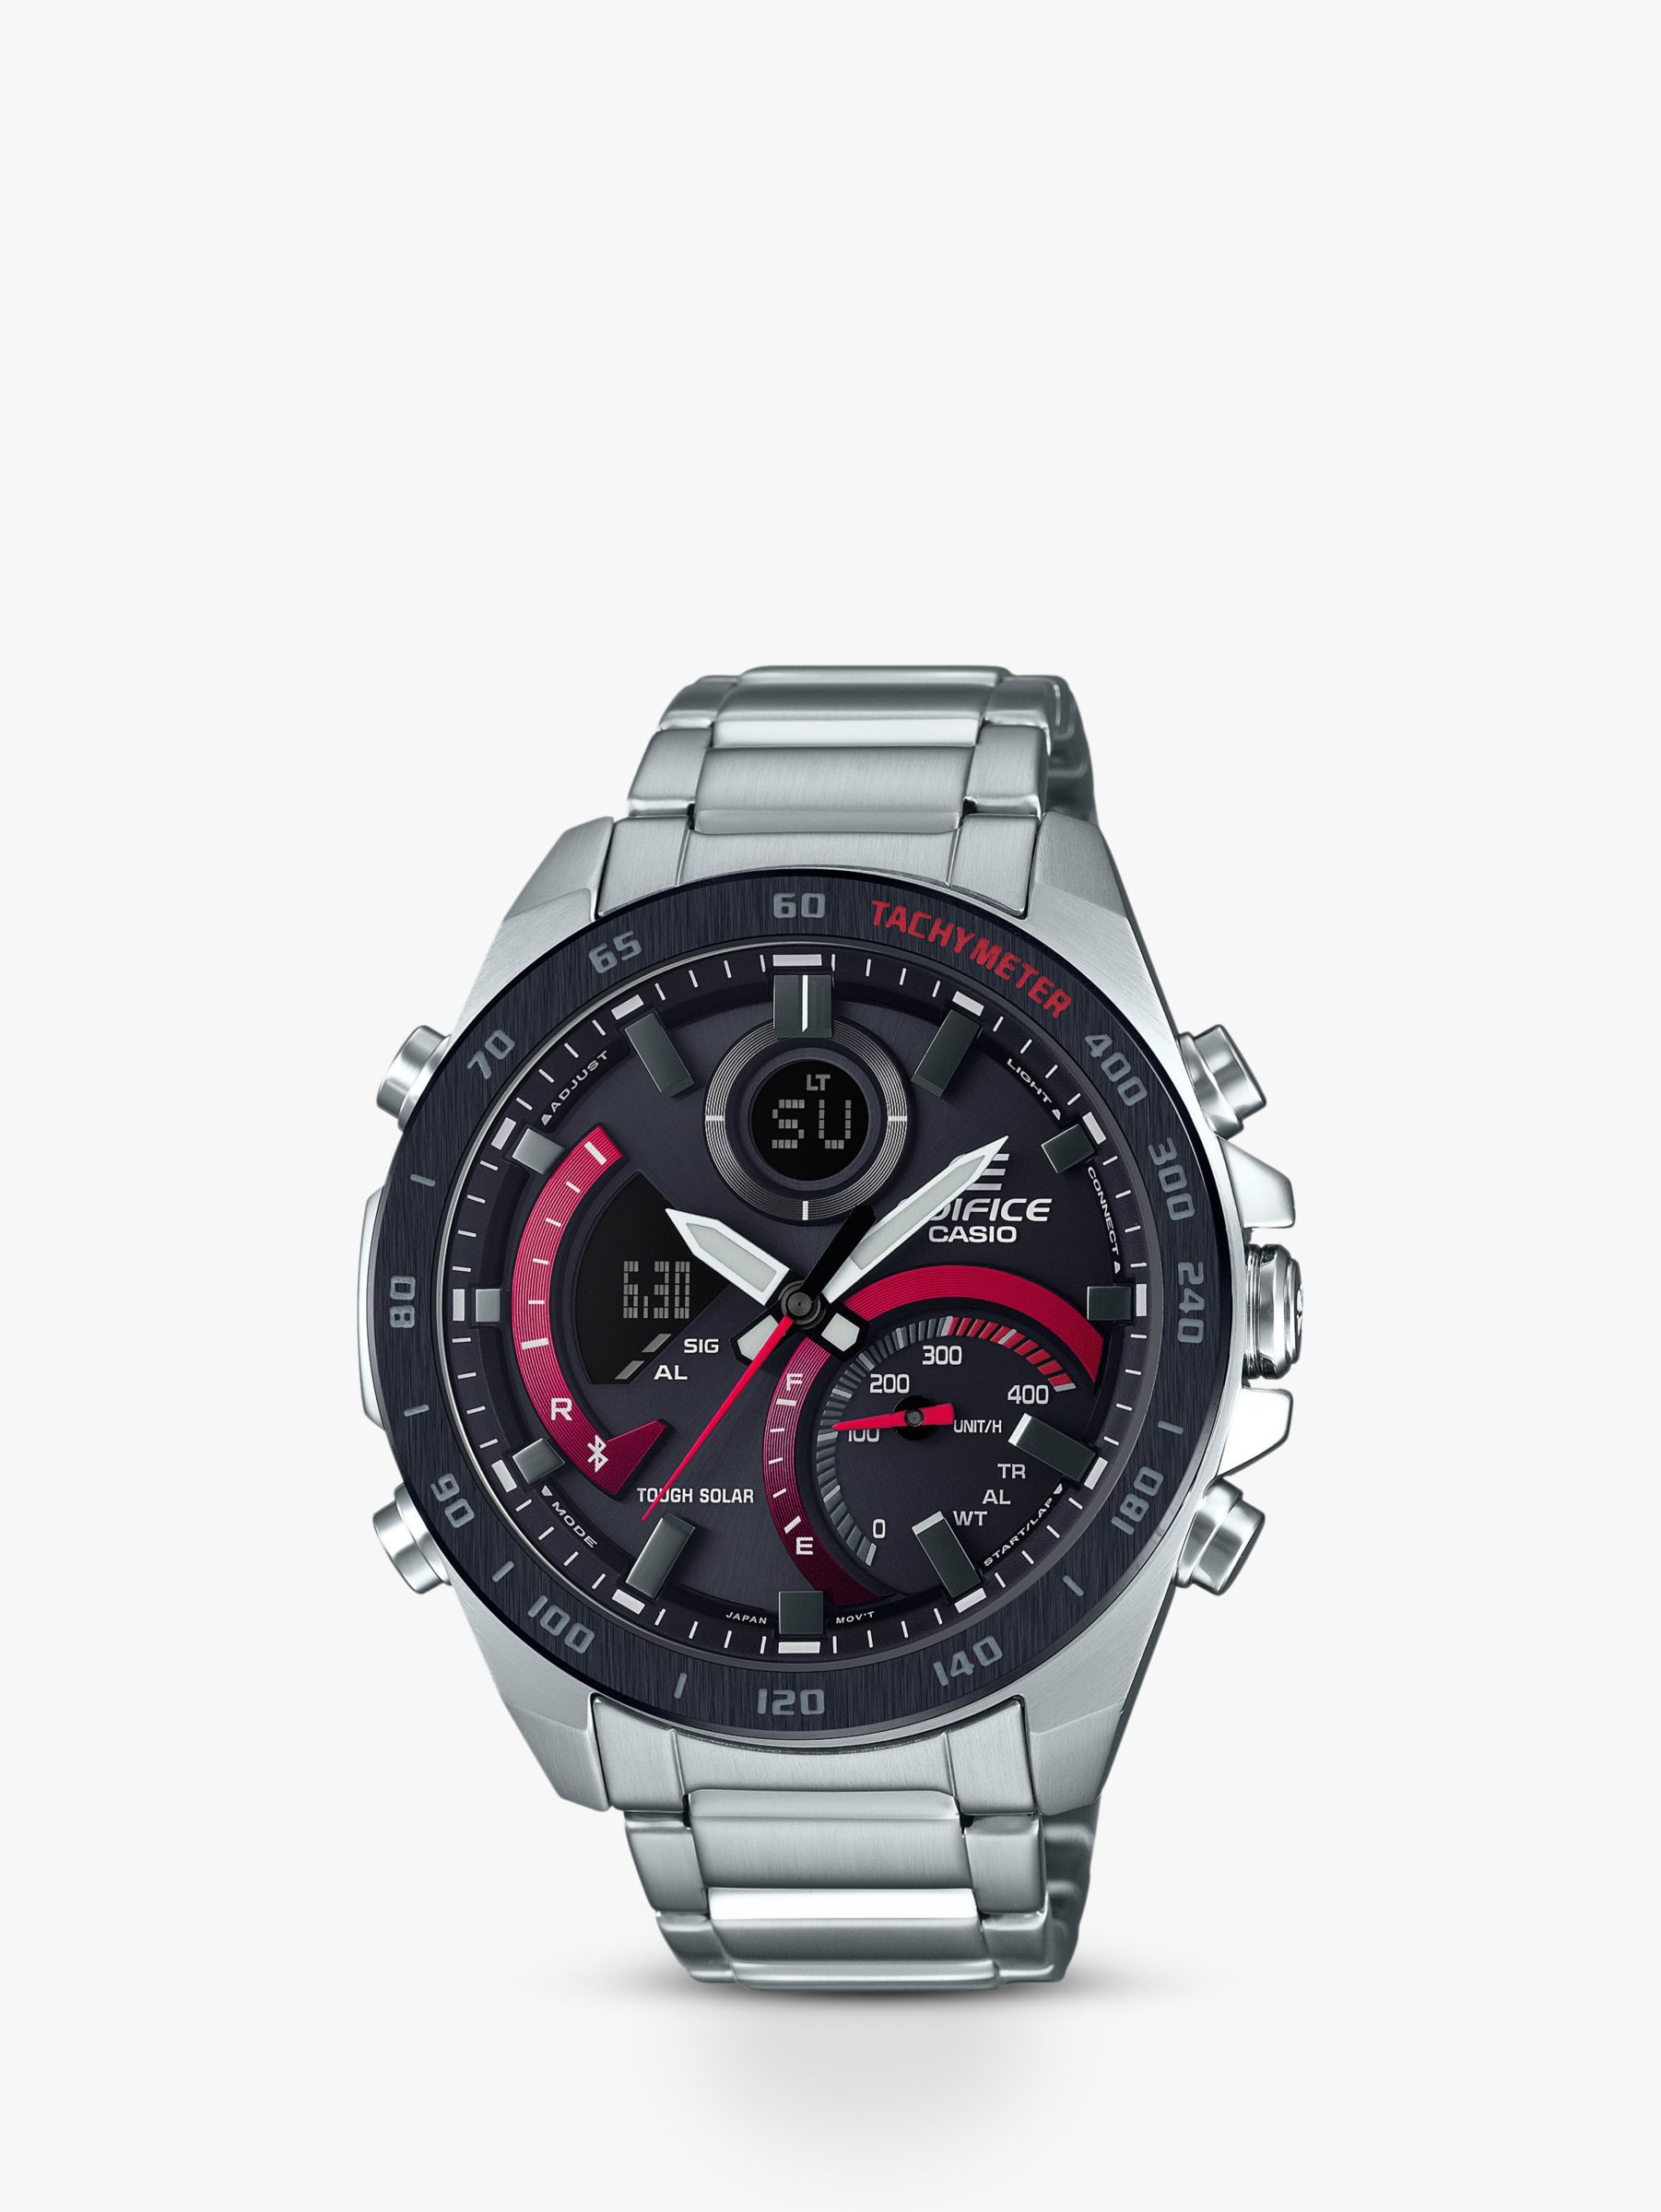 Casio Casio ECB-900DB-1AER Men's Edifice Solar Chronograph Date Bracelet Strap Watch, Silver/Black